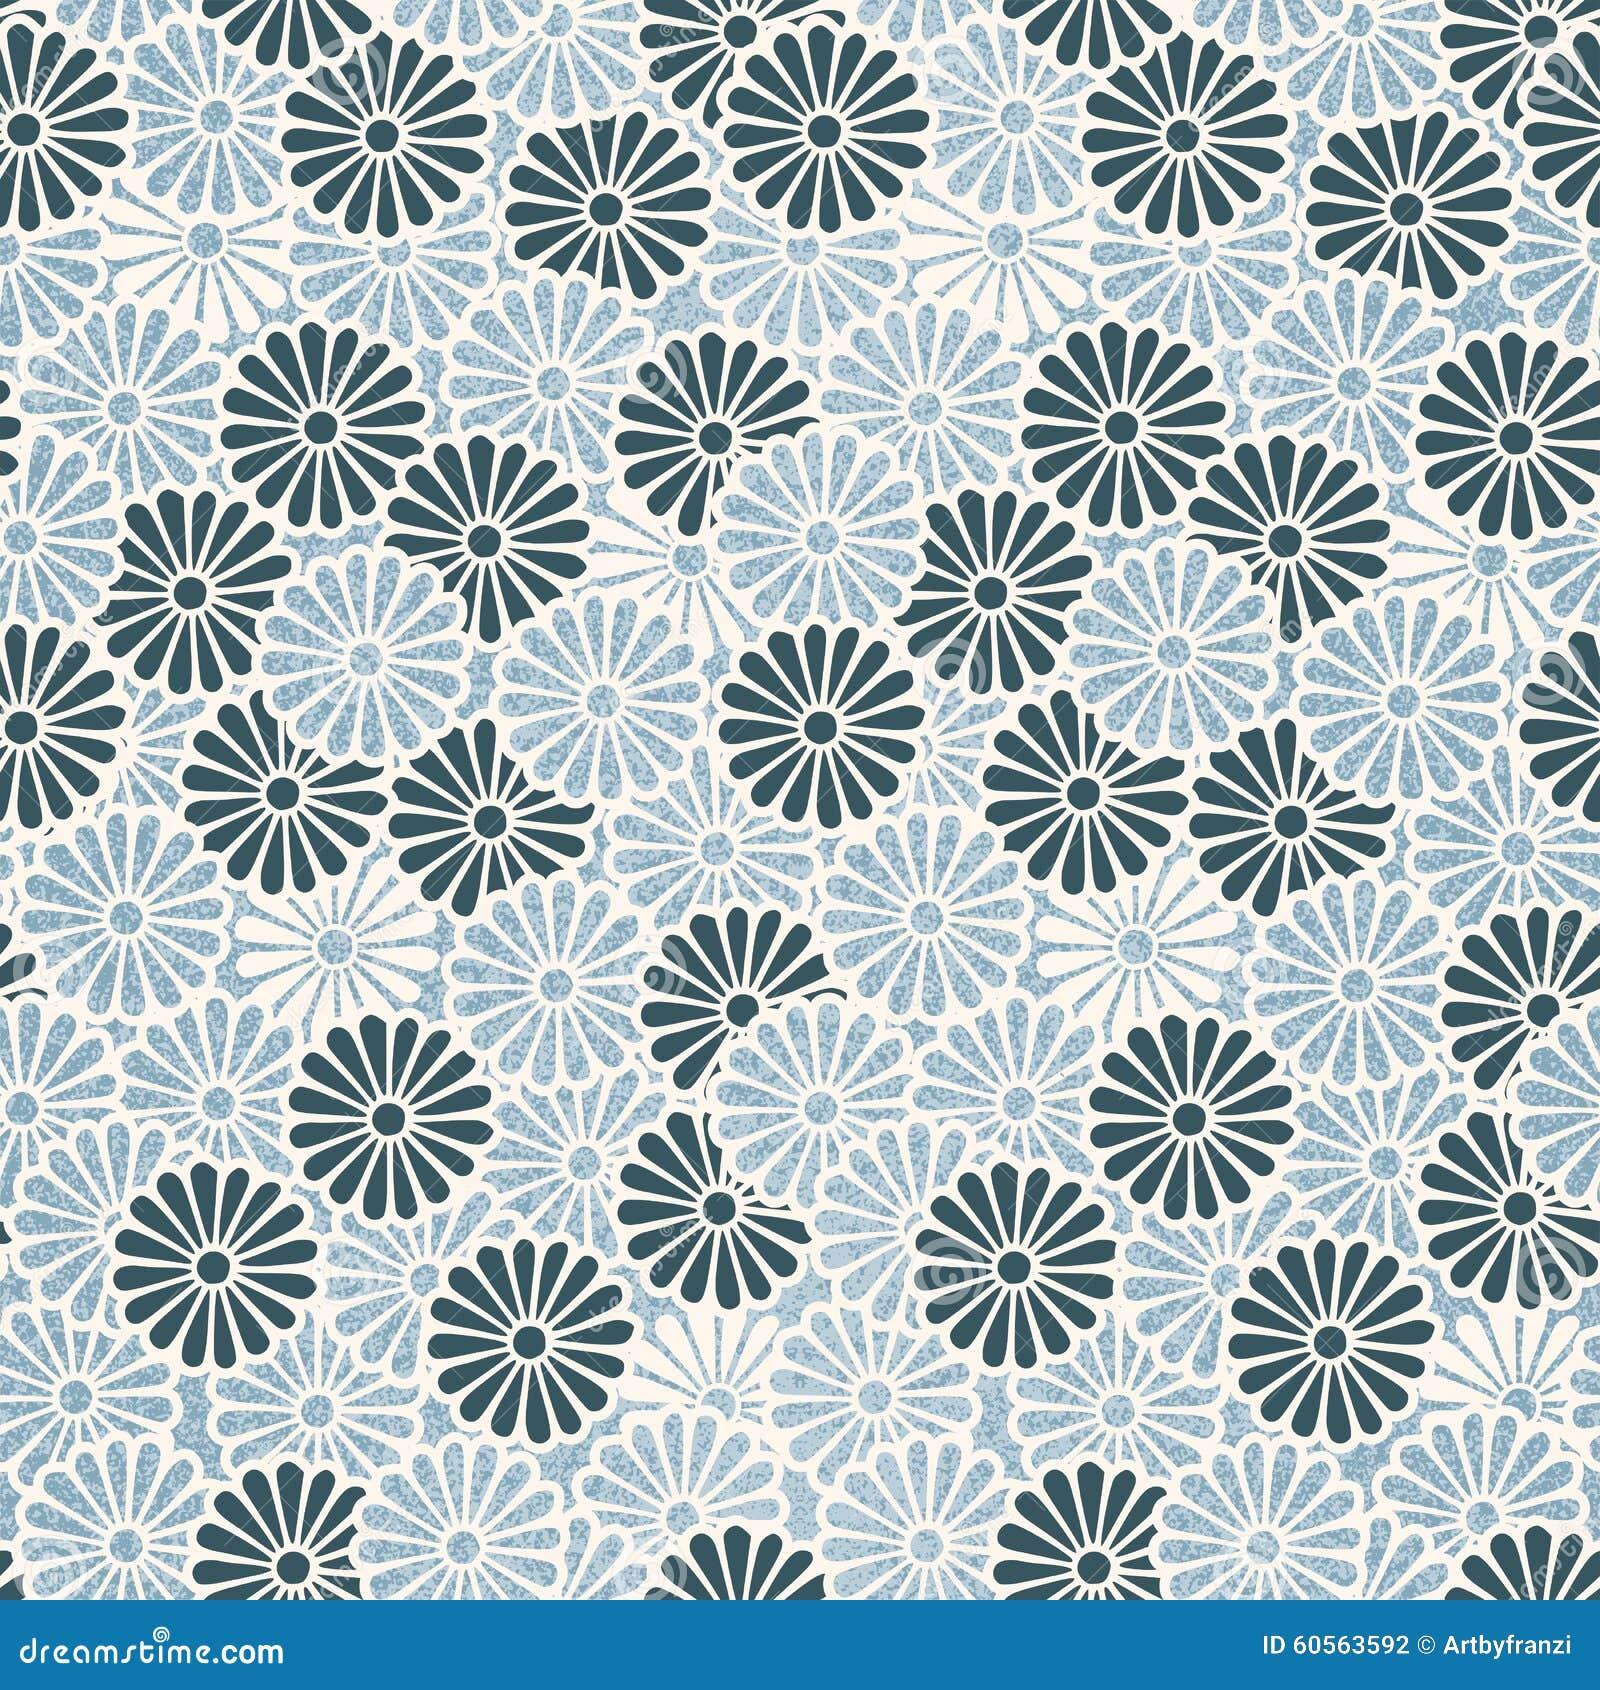 Vintage Japanese Seamless Flower Pattern Stock Vector ...